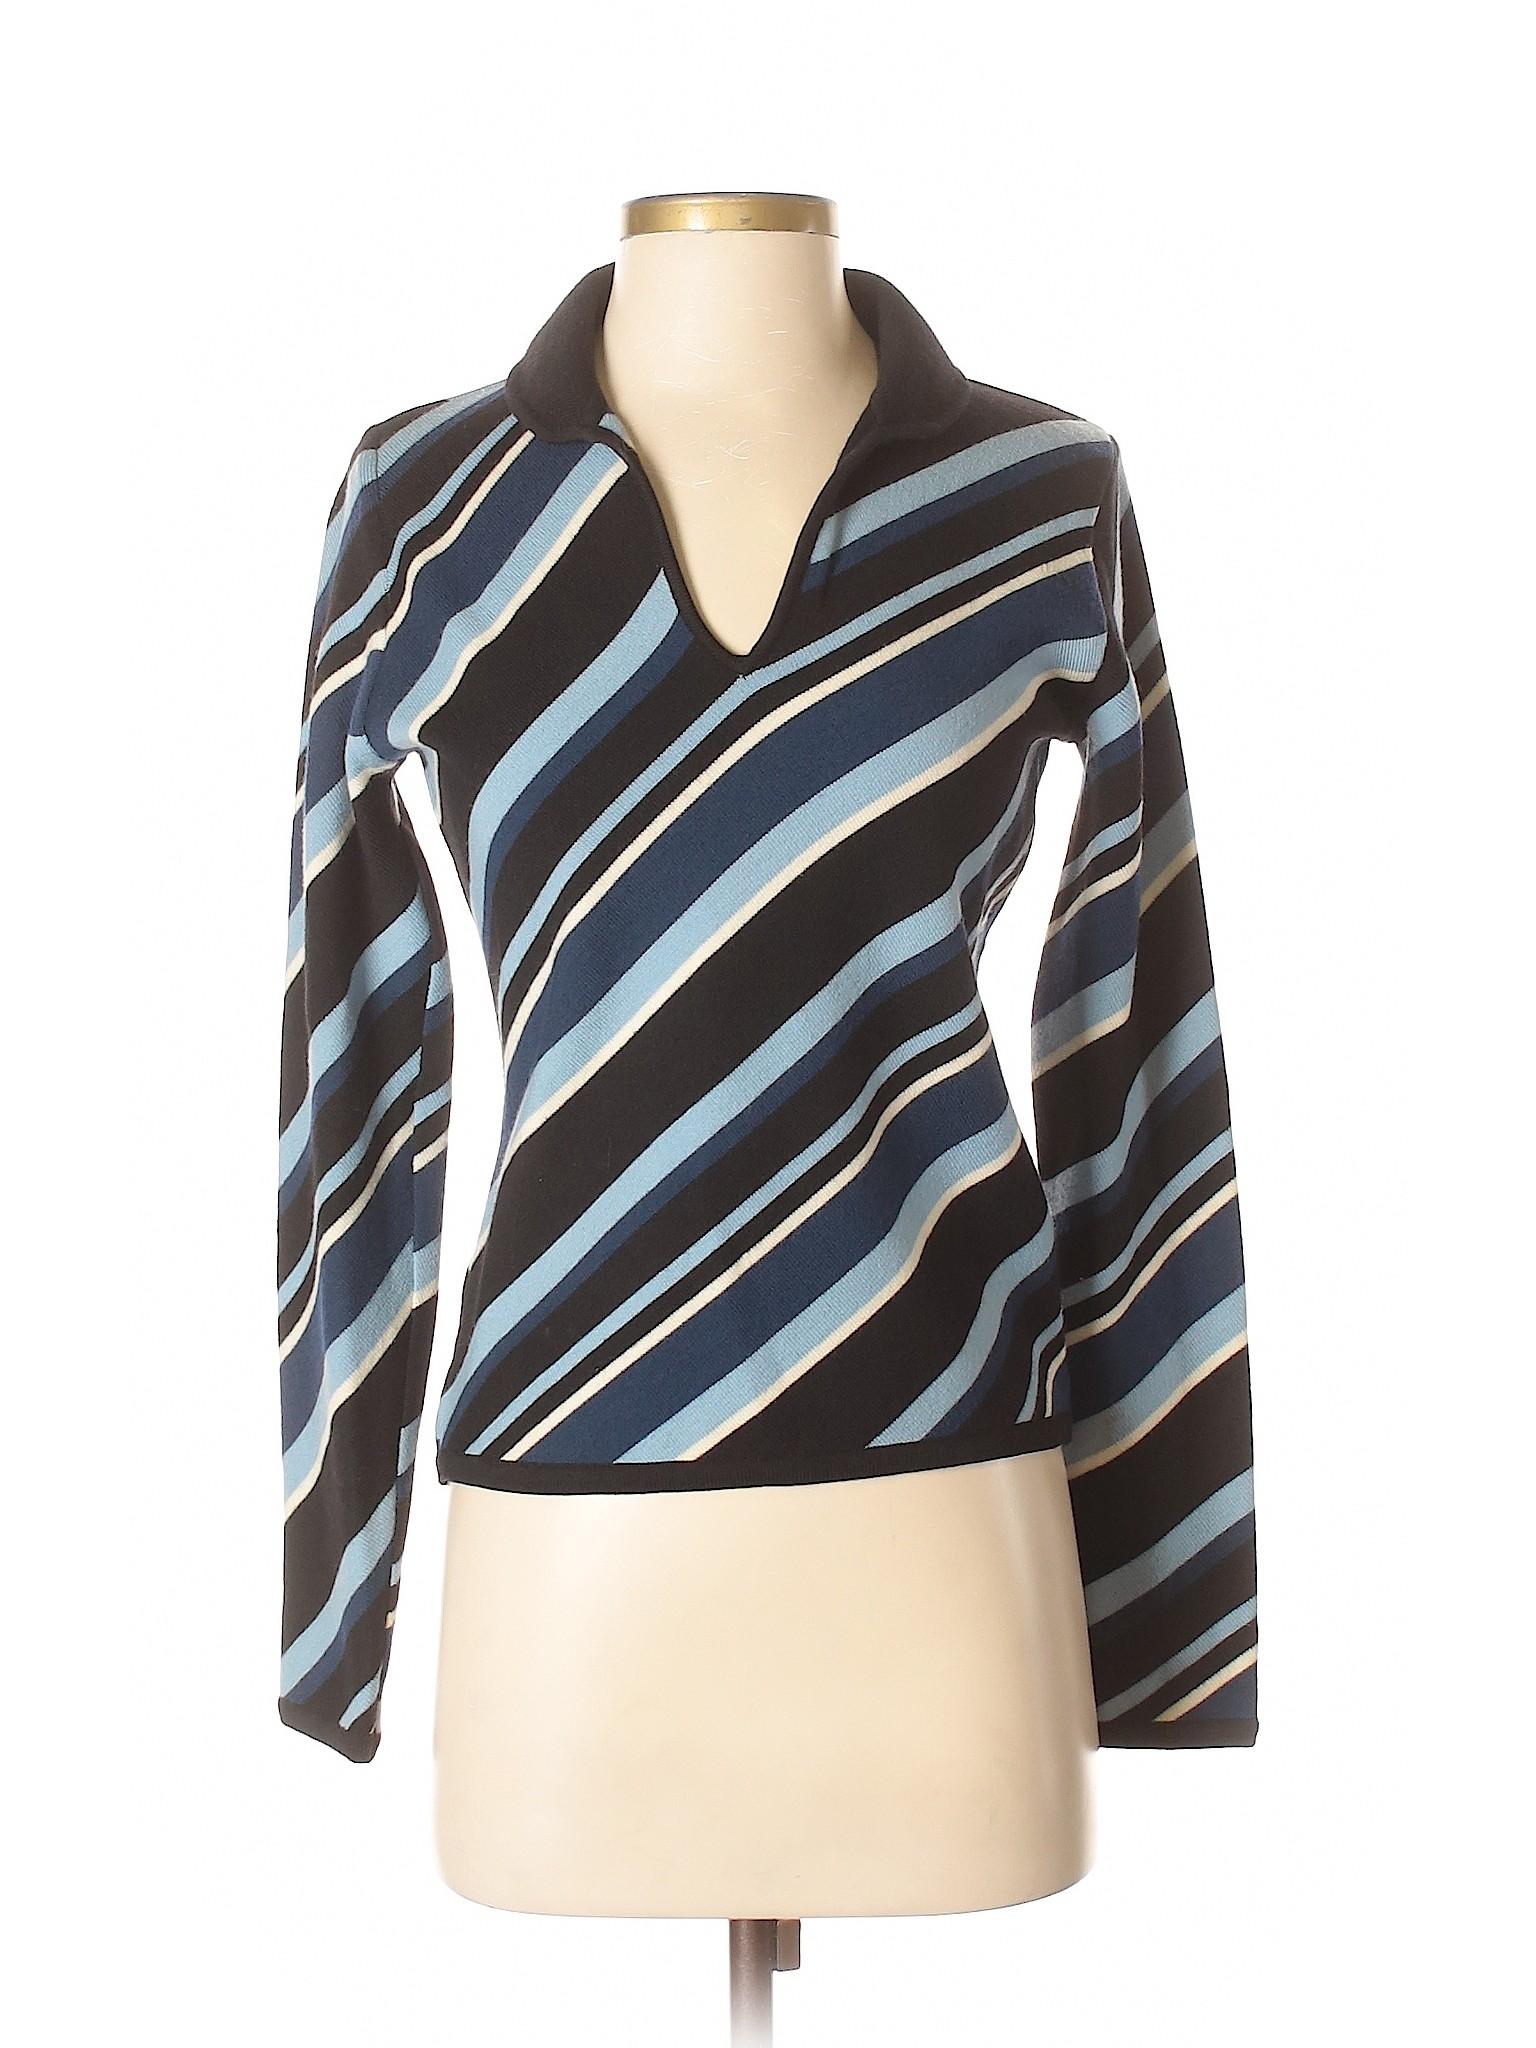 Buchman Pullover Wool Boutique winter Sweater Dana UwqUT4x